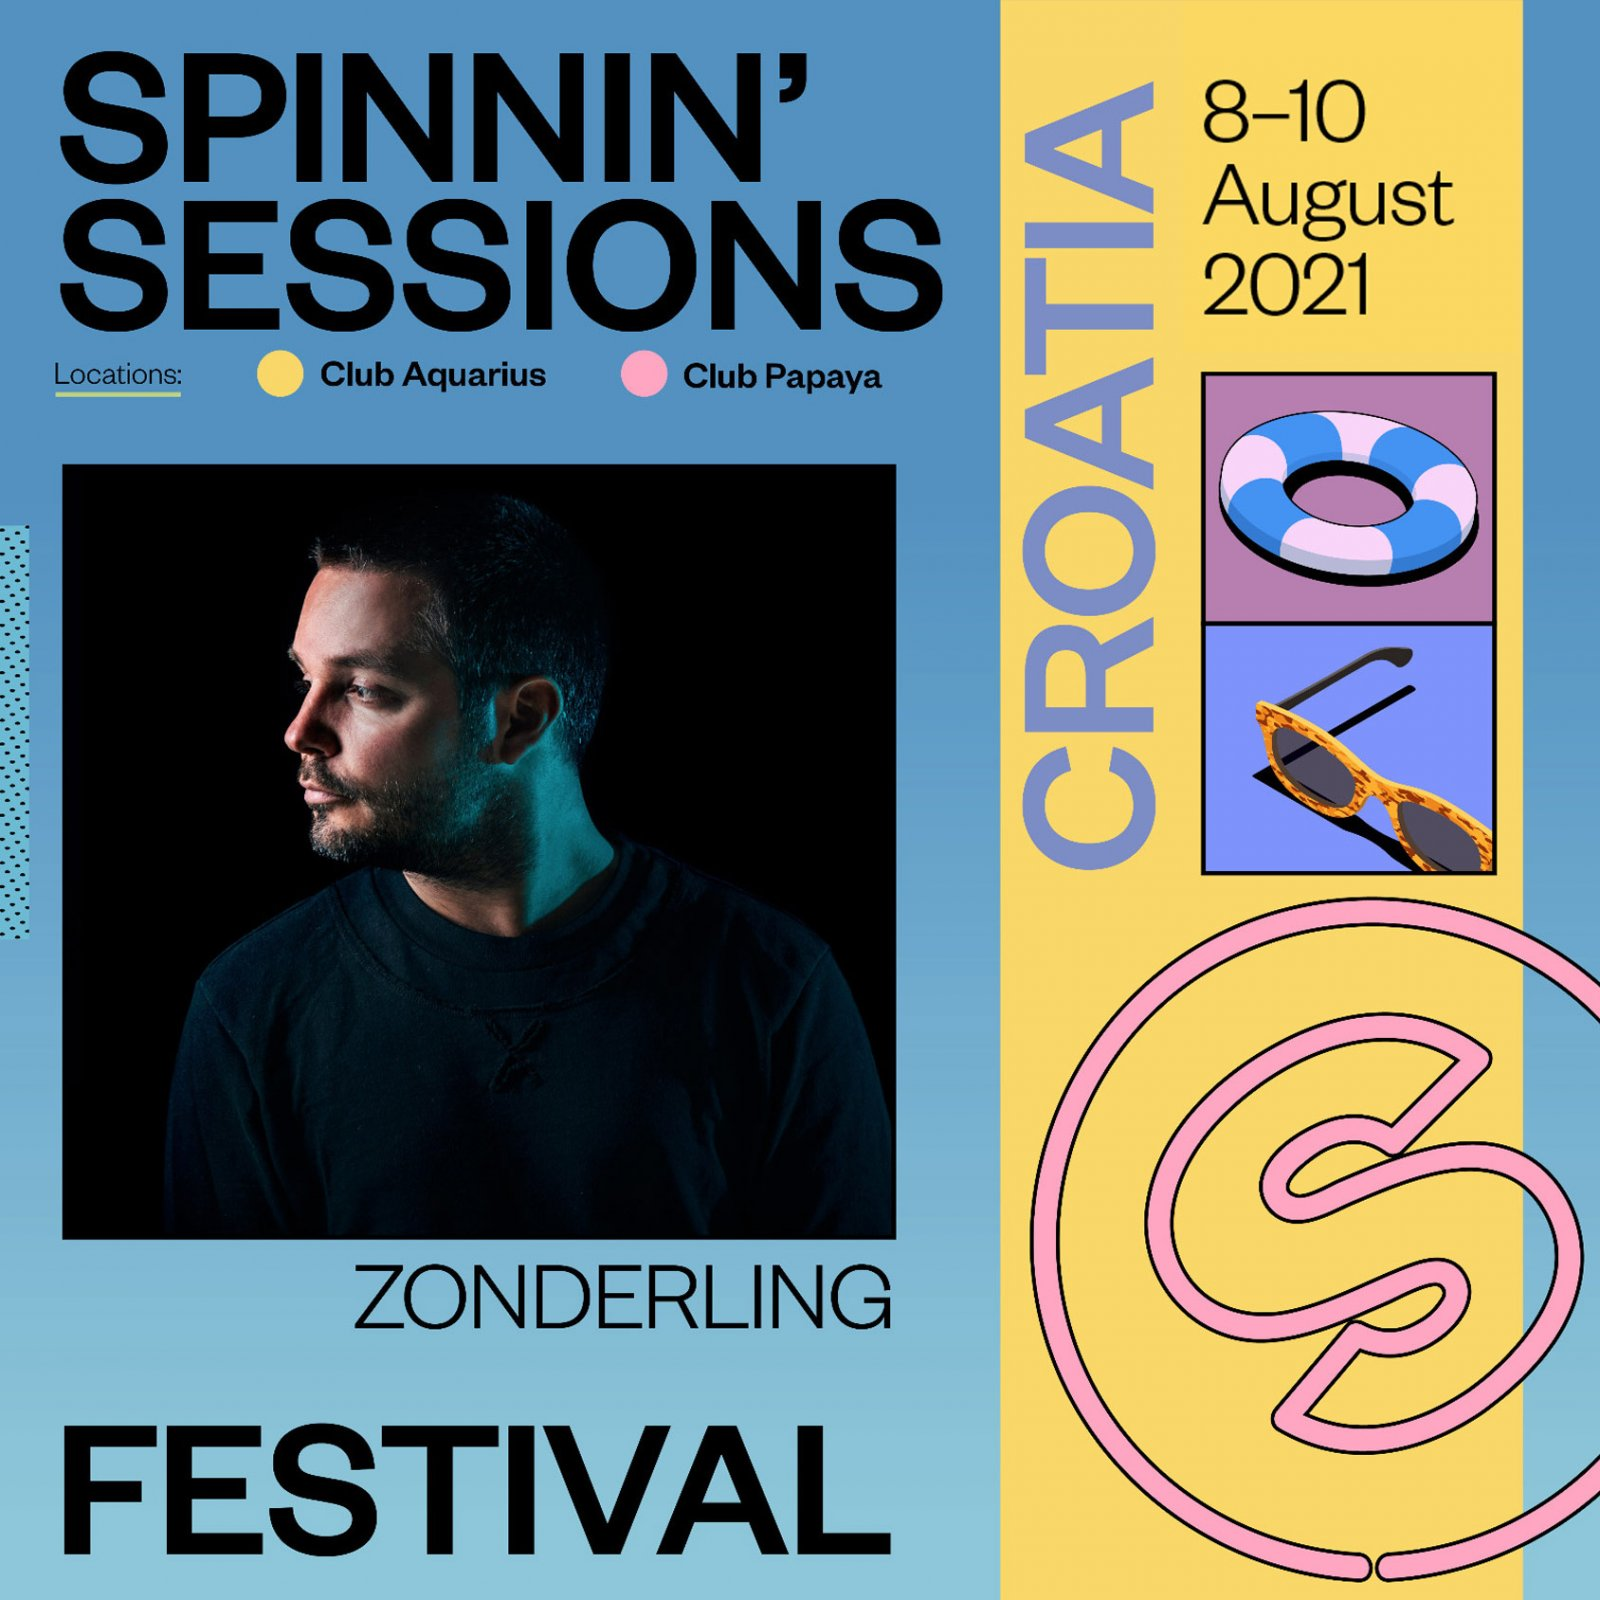 Spinnin' Sessions Festival Croatia 2021 Zonderling